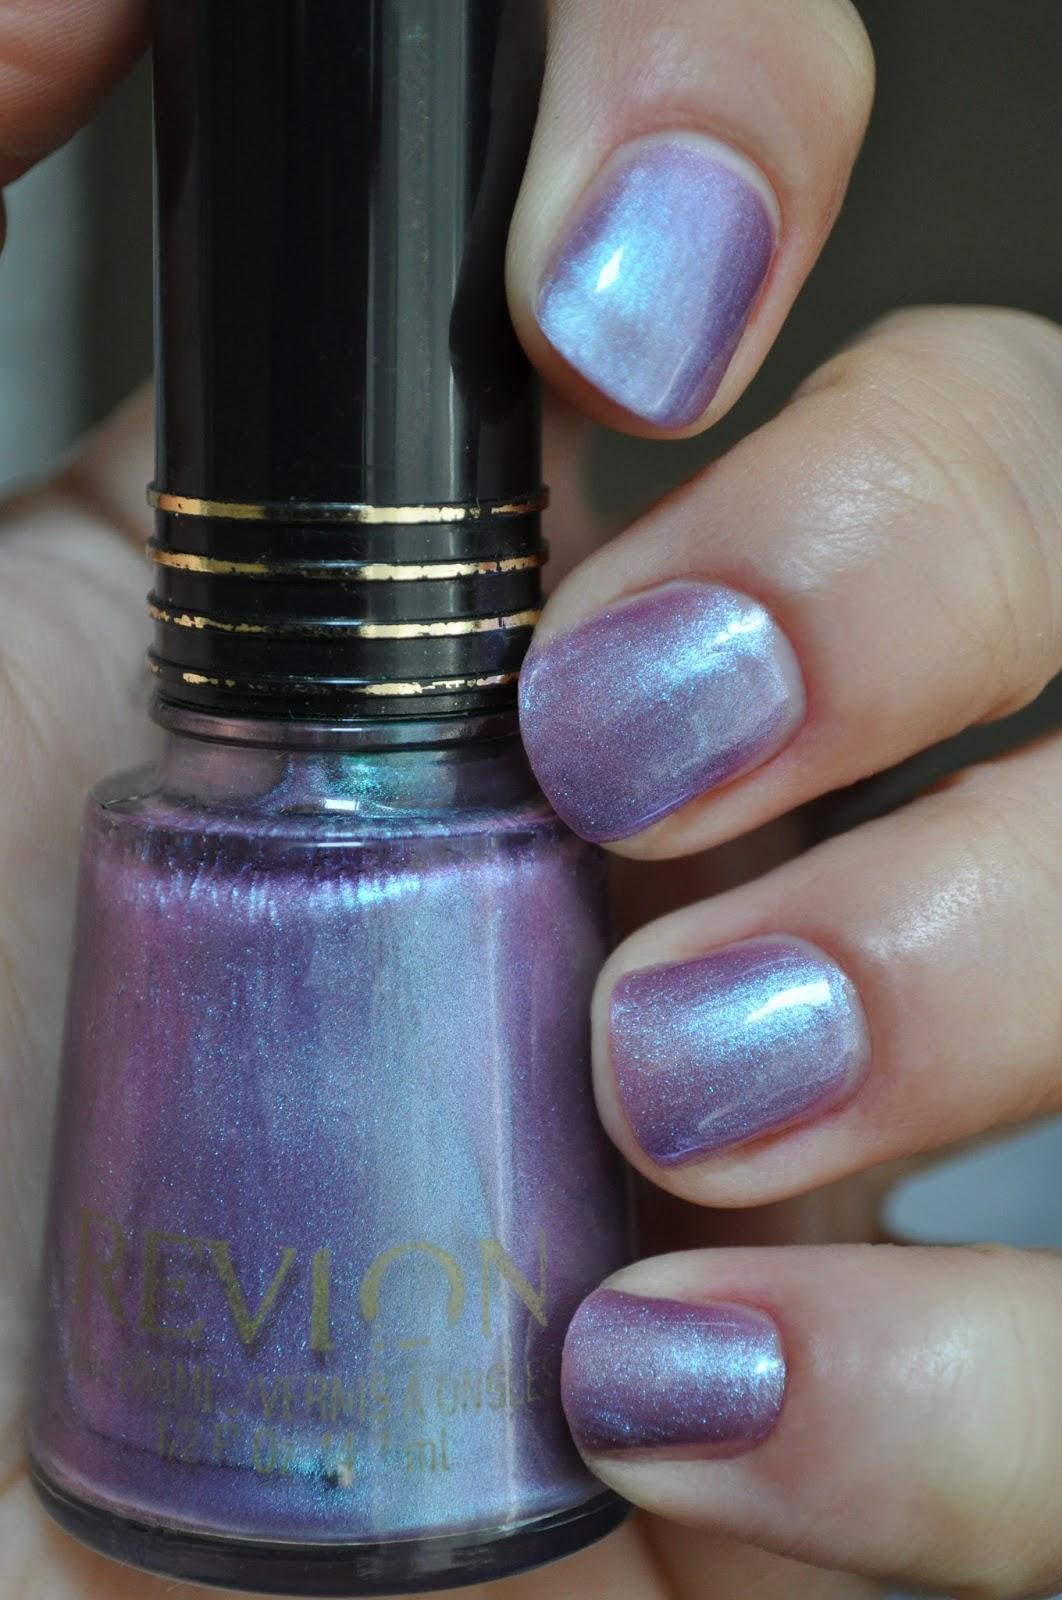 So Lonely in Gorgeous: Laser Lavender, Revlon Nail Enamel!